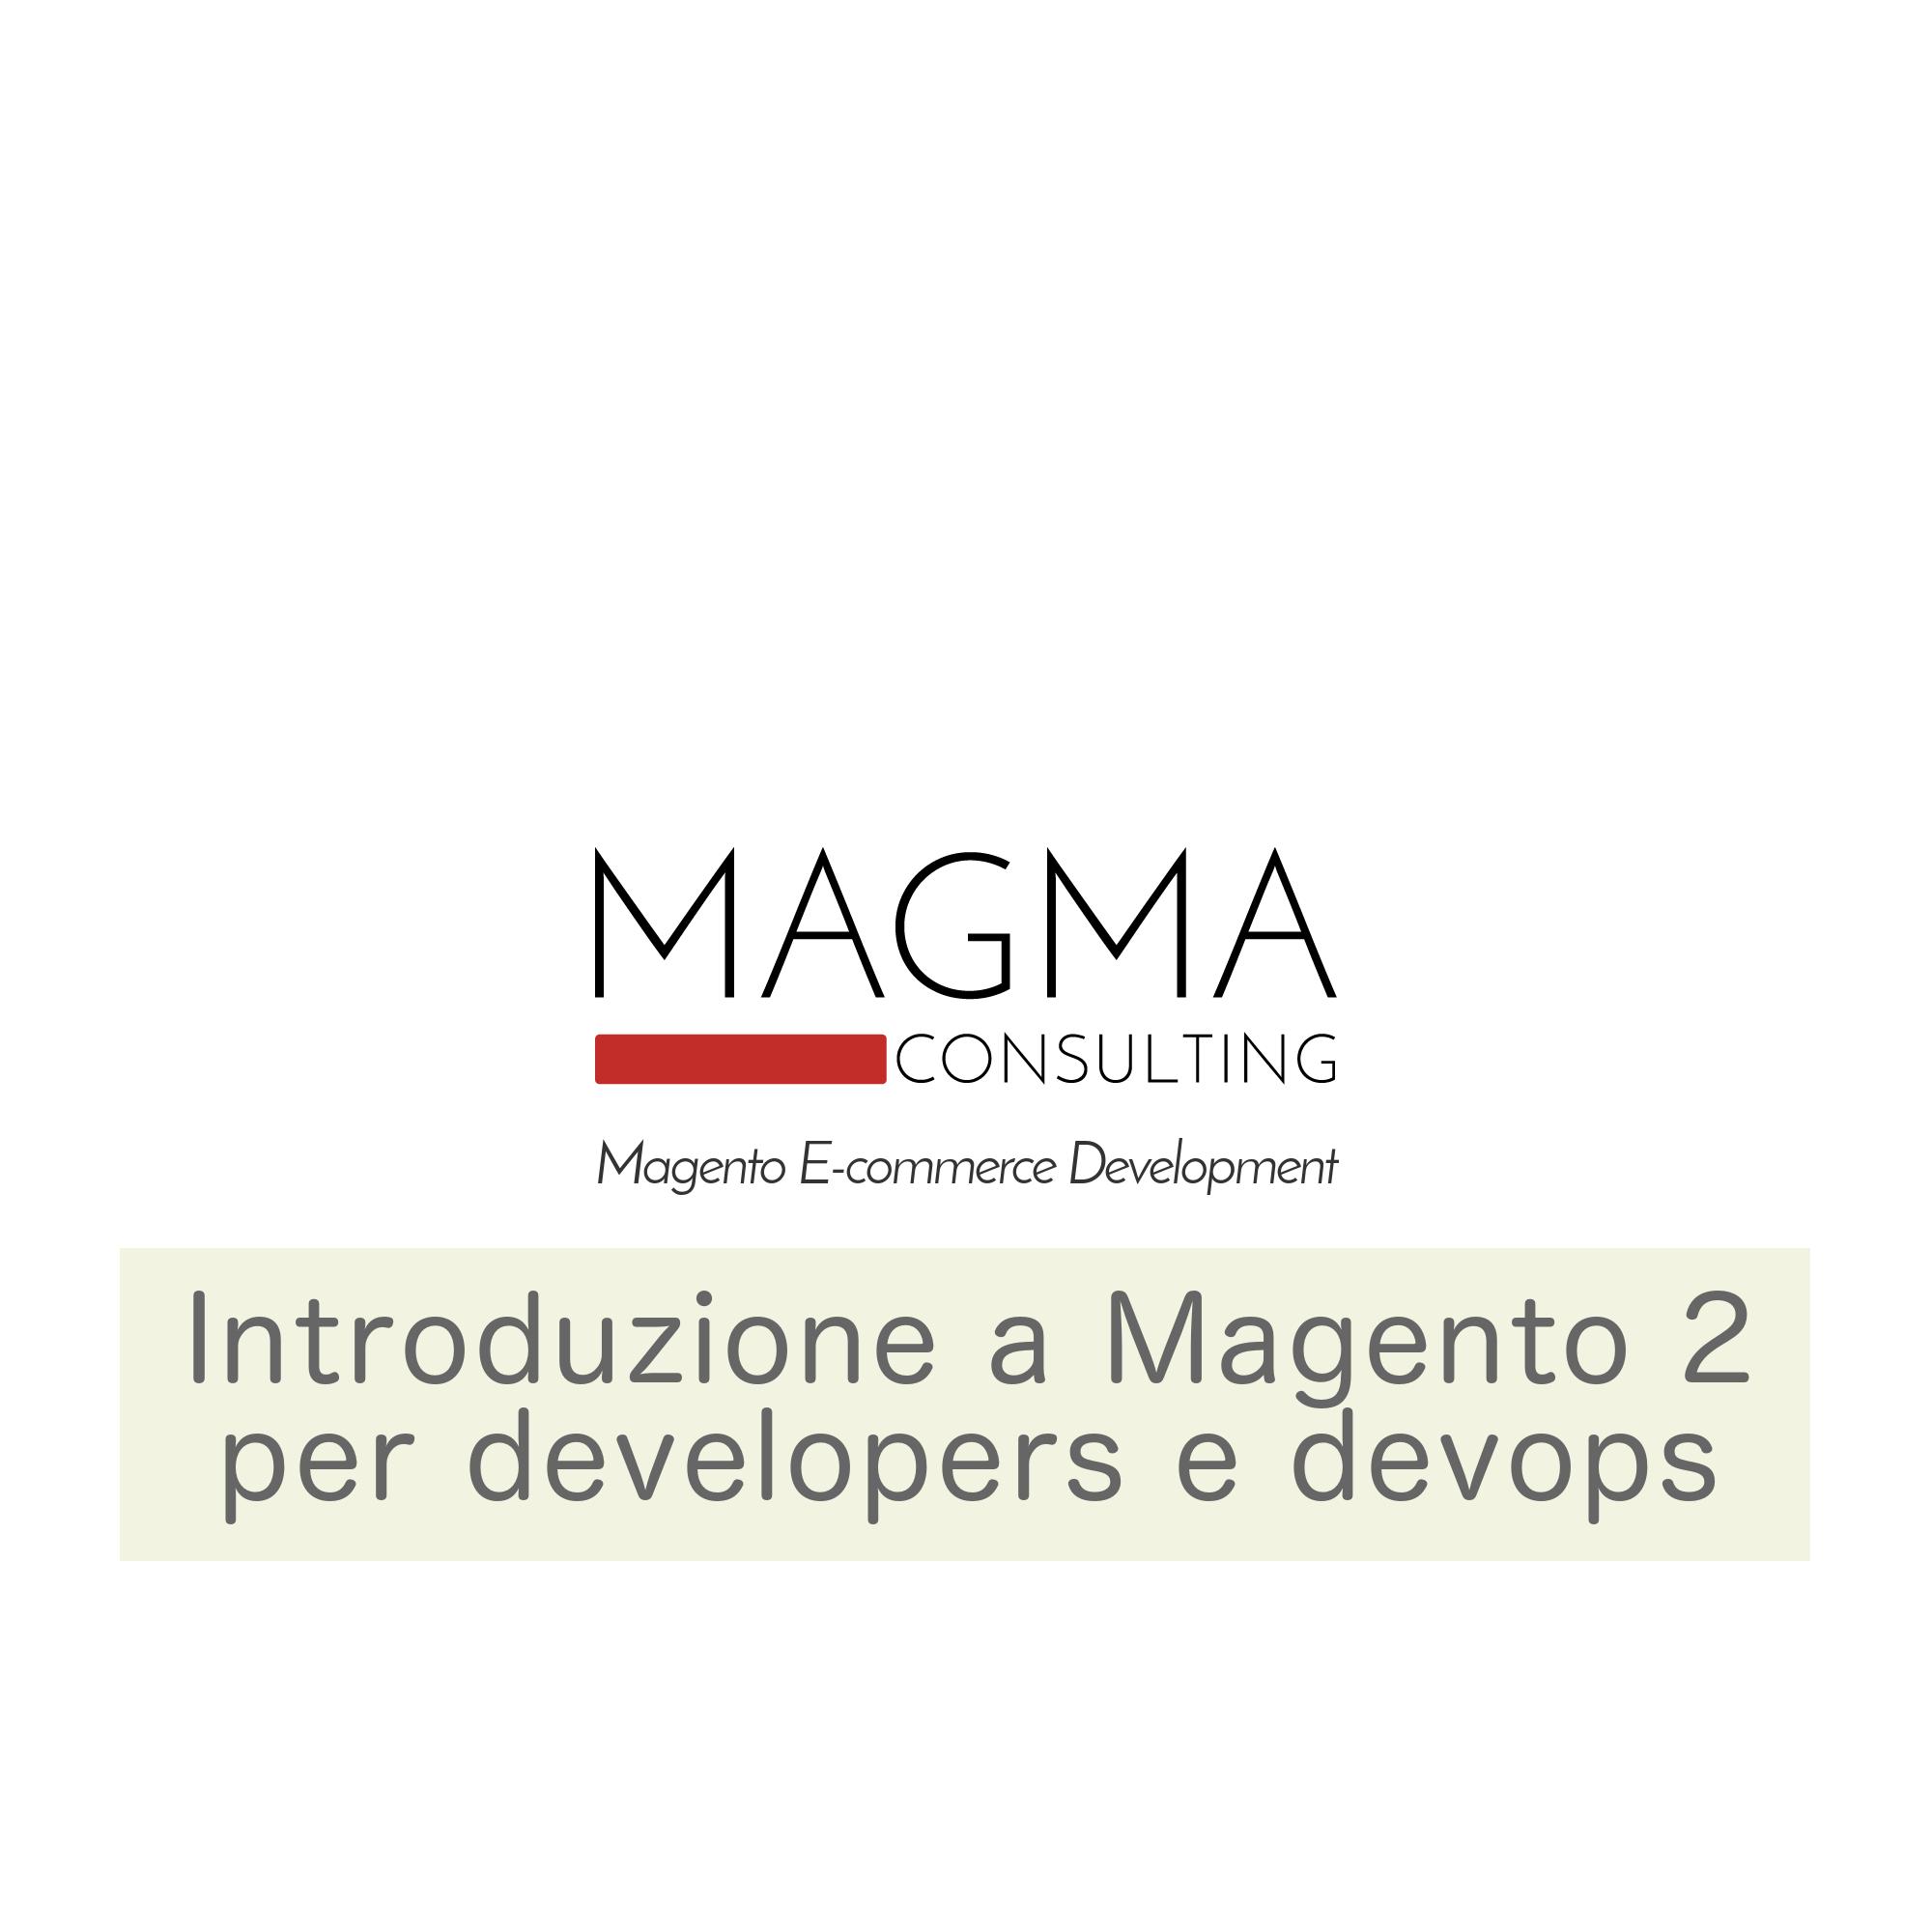 Introduzione a Magento 2 per developers e devops